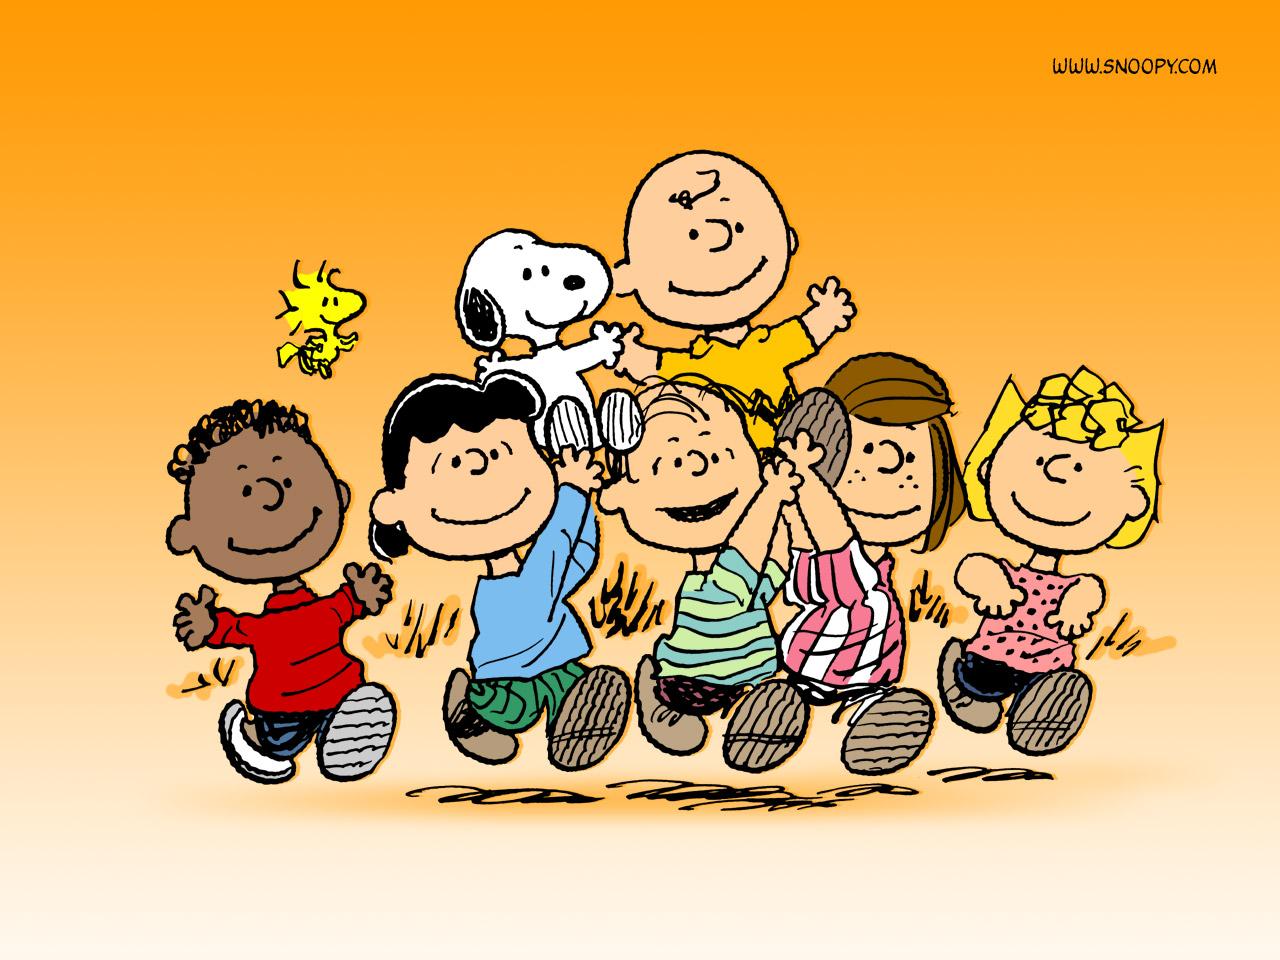 Peanuts (franquicia)